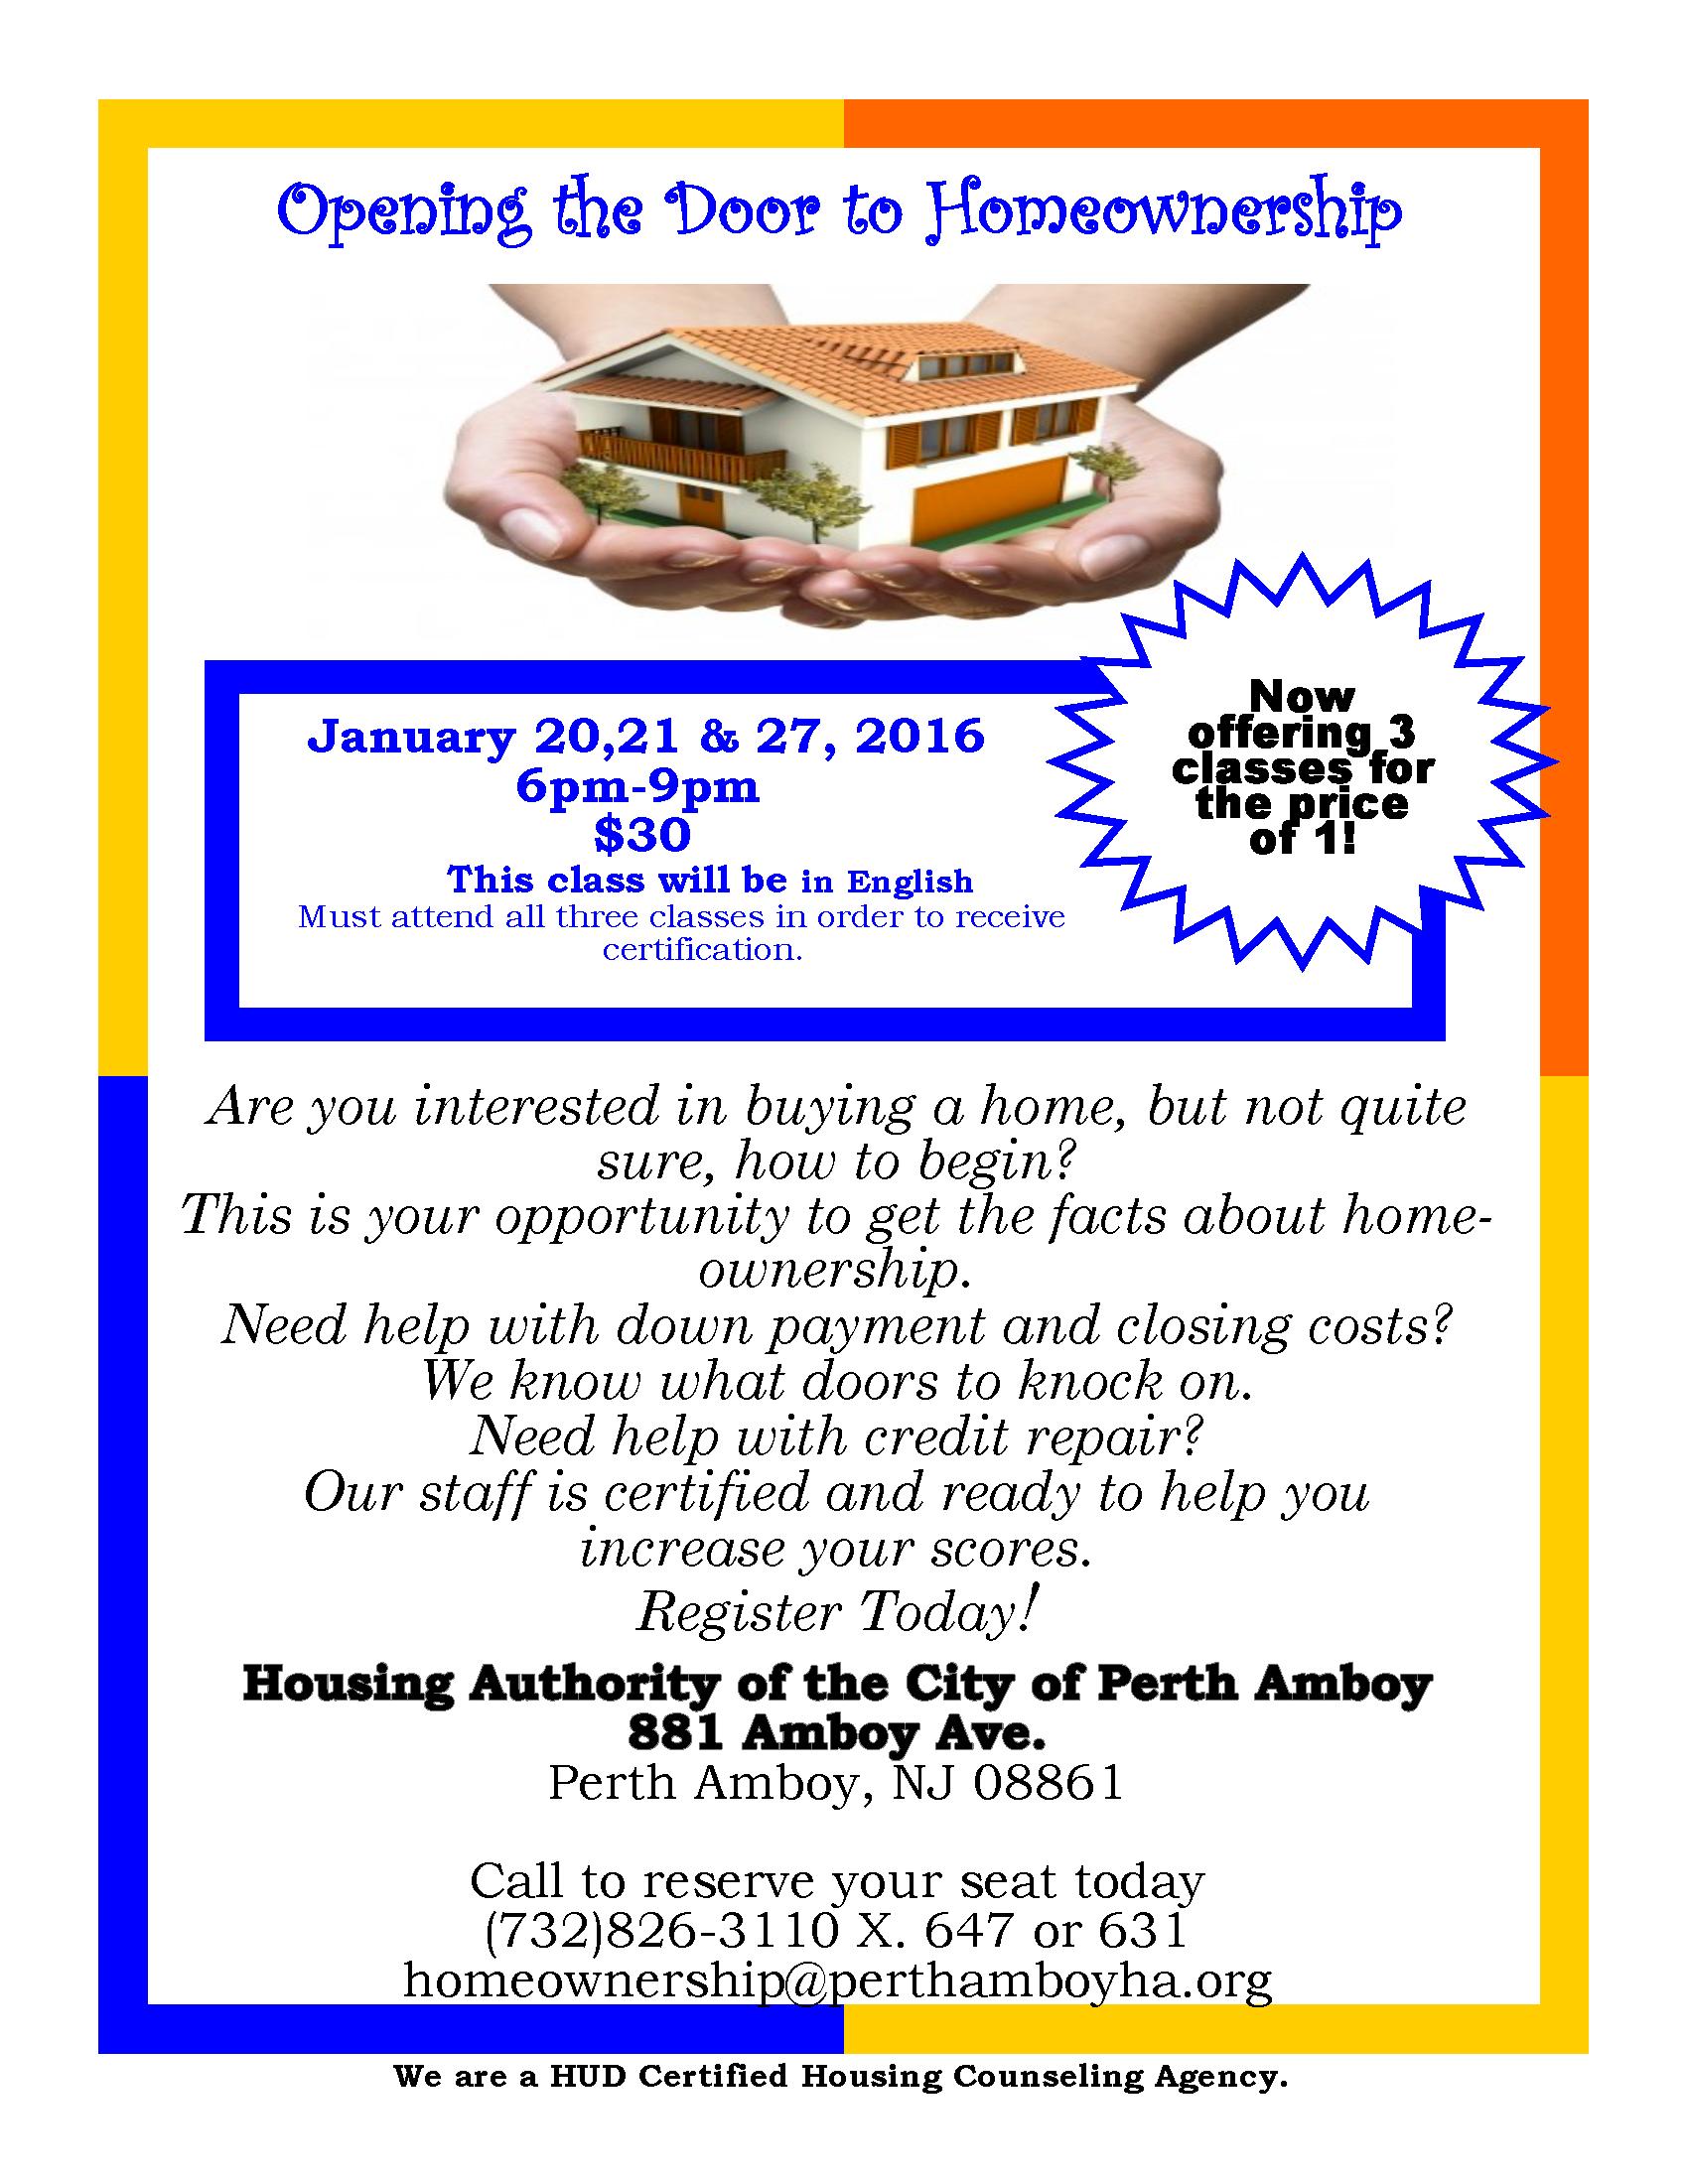 Perth Amboy Redevelopment Team For Neighborhood Enterprise And